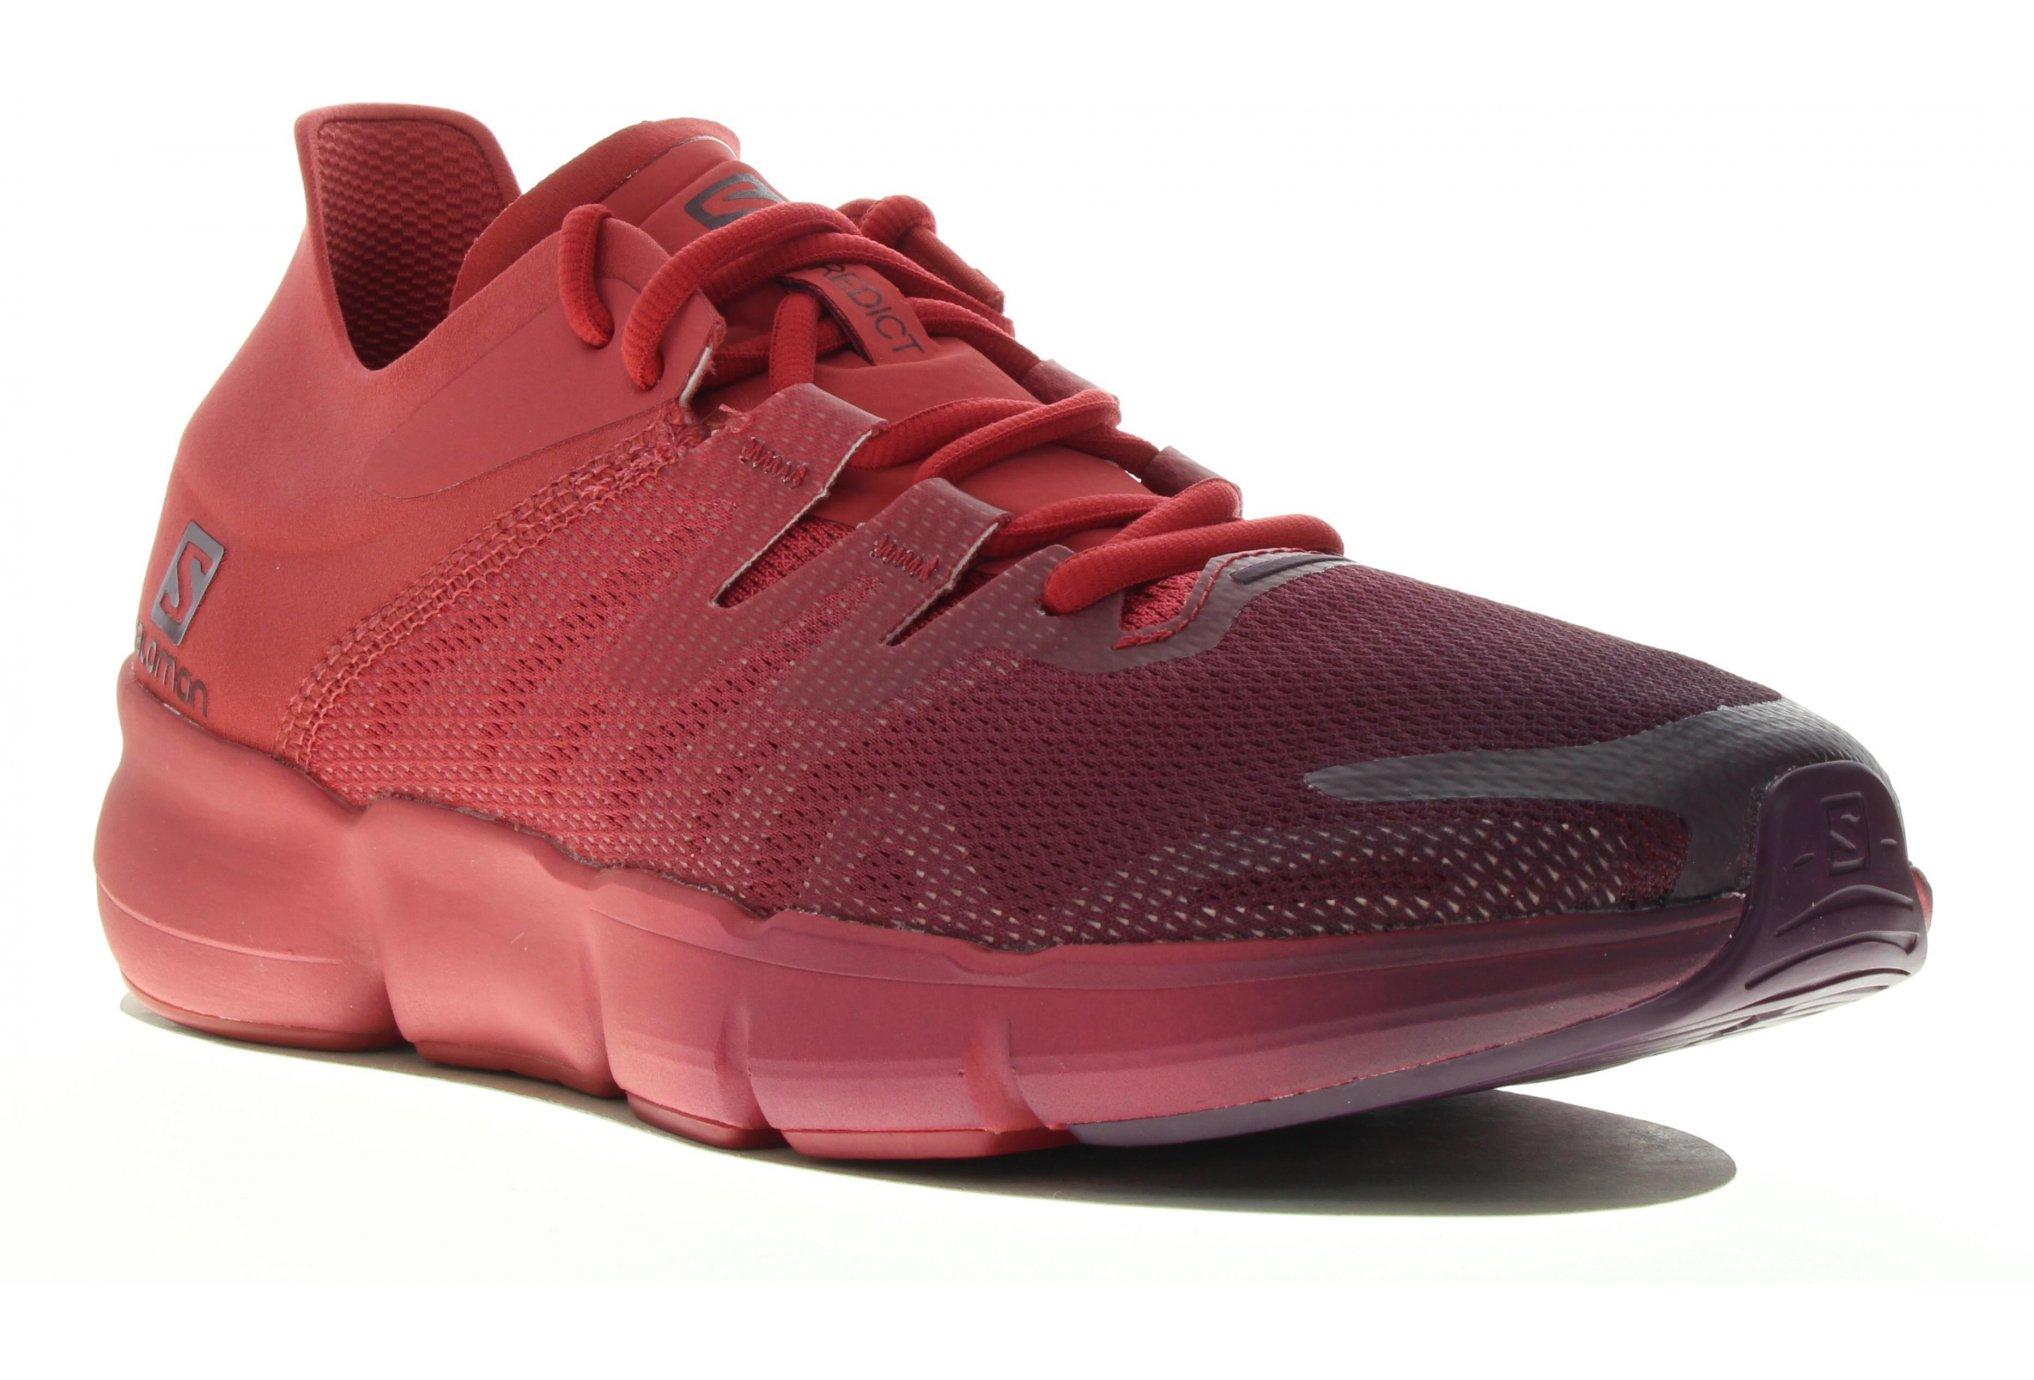 Salomon Predict RA Chaussures running femme